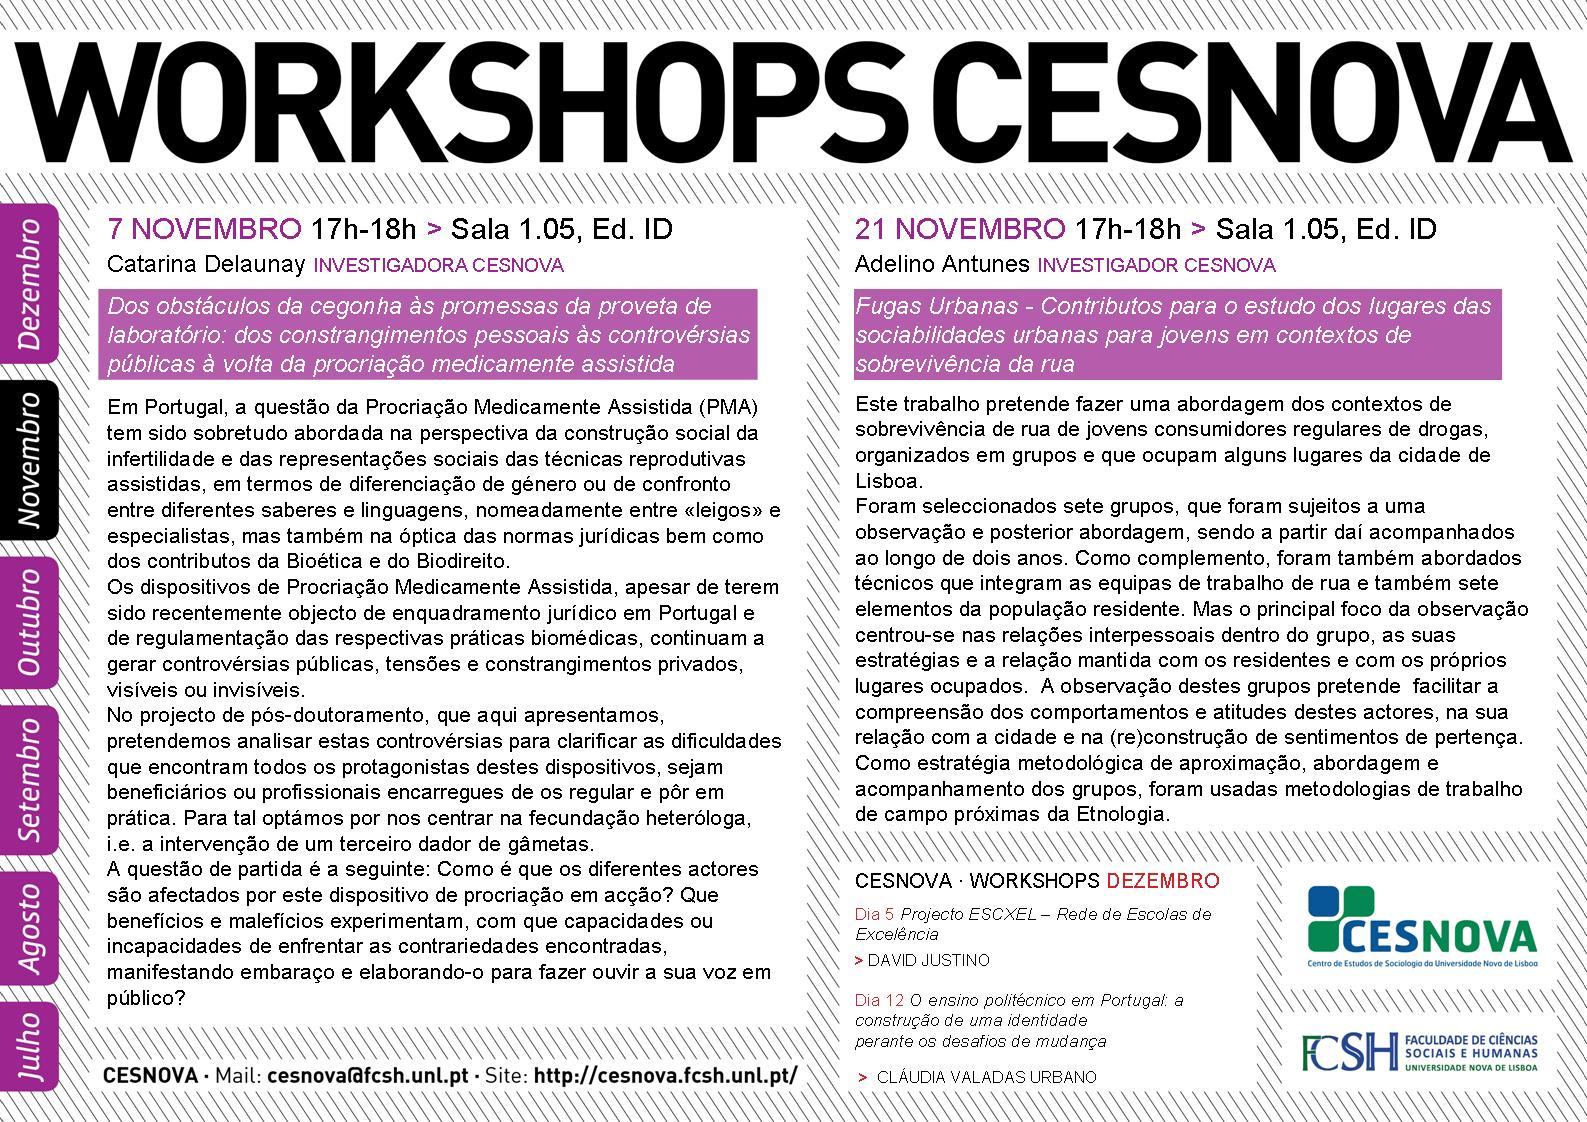 Workshop CesNova